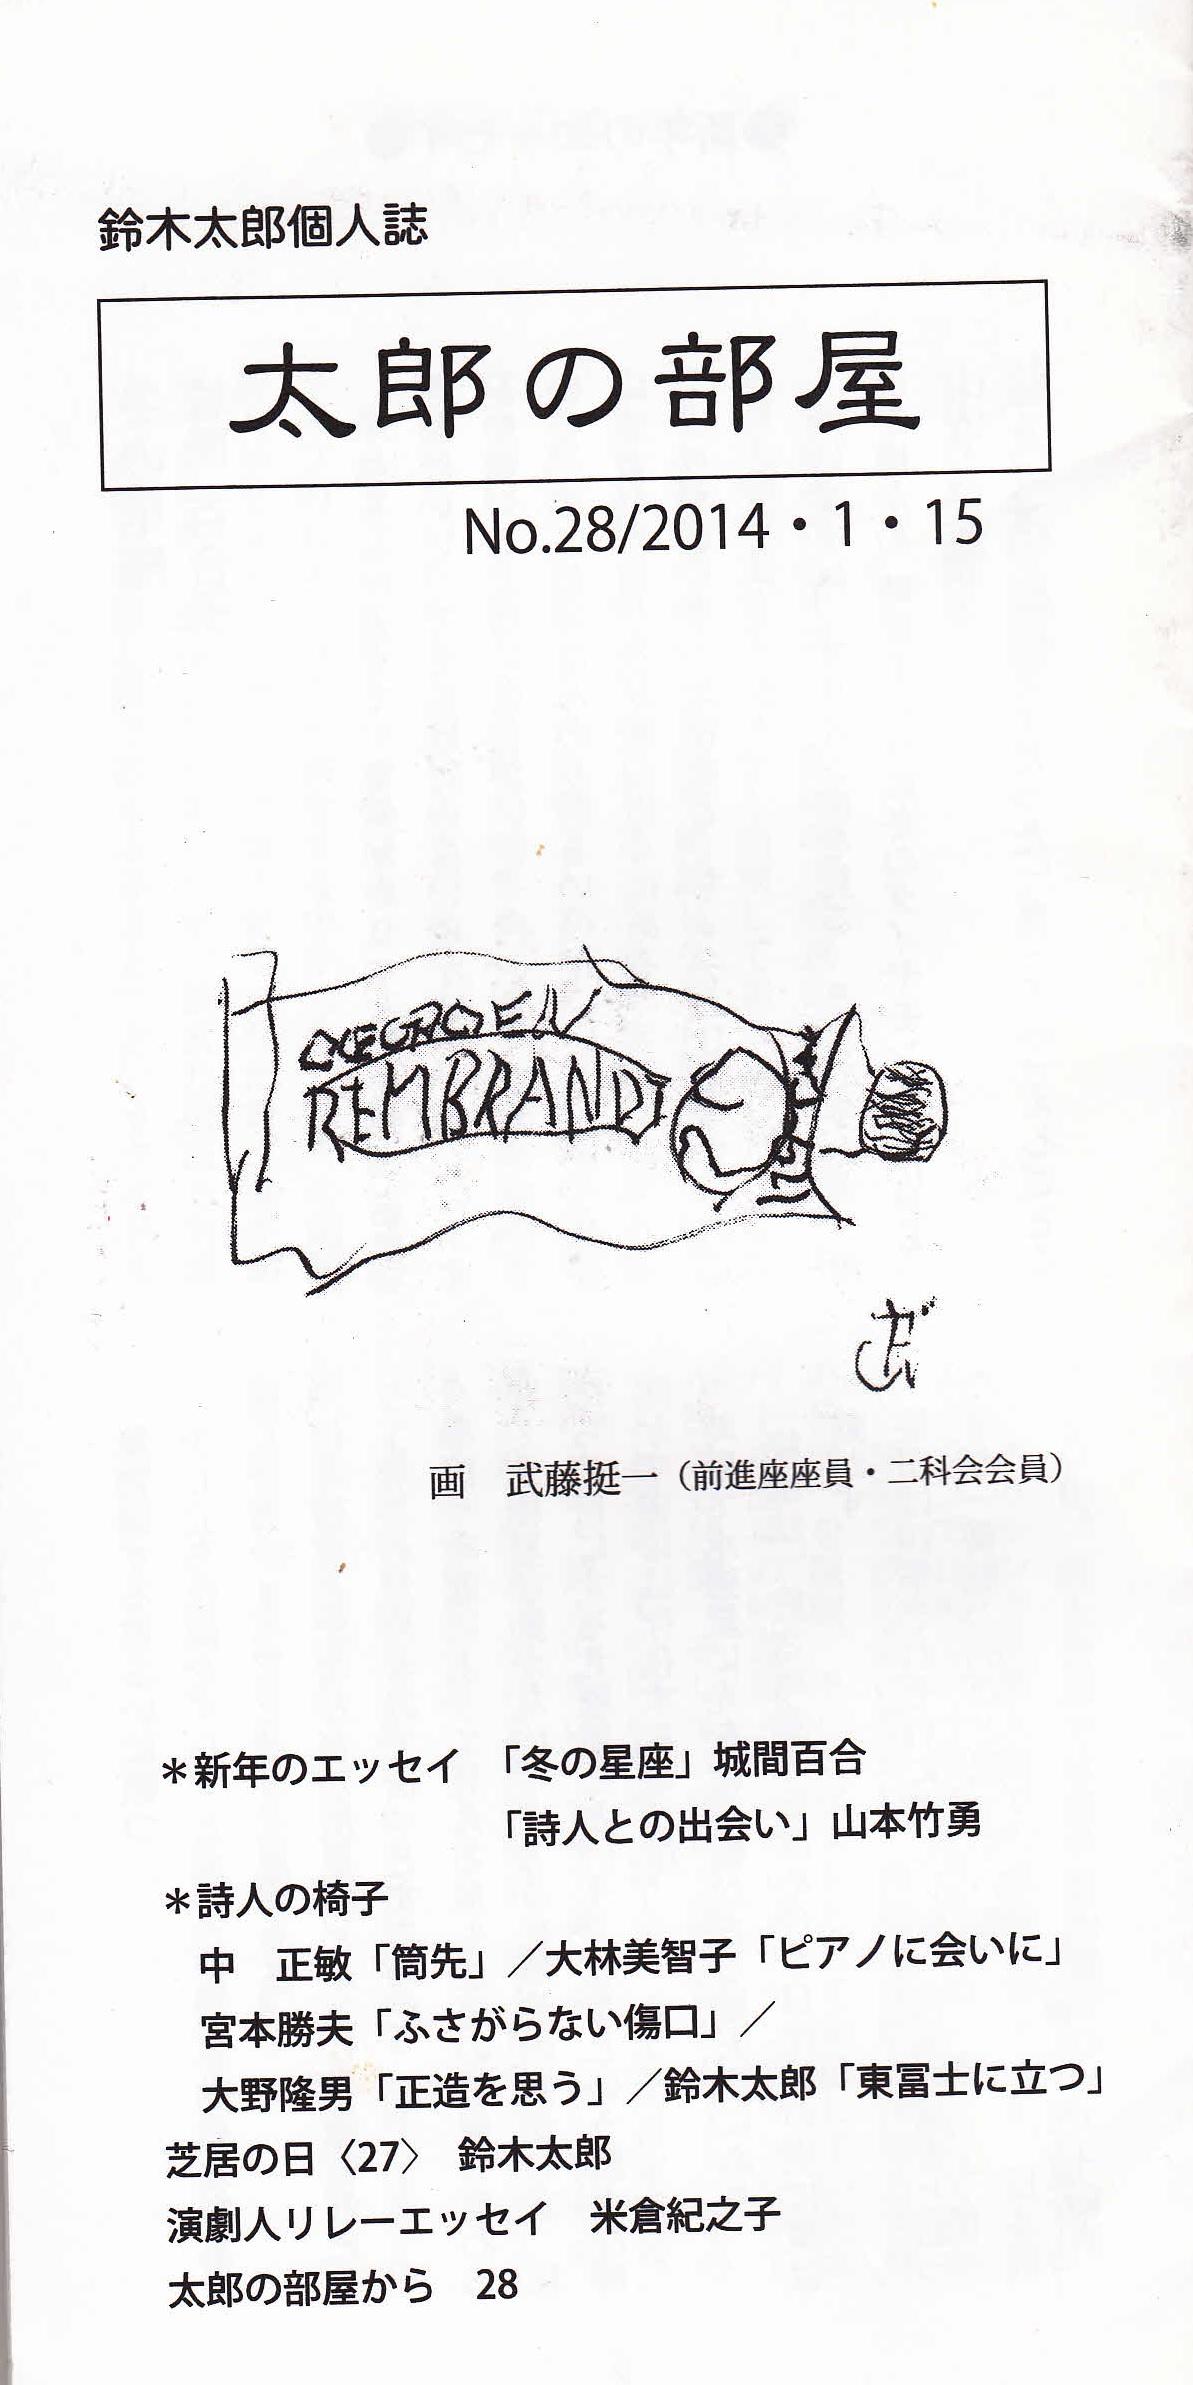 太郎の部屋 28号